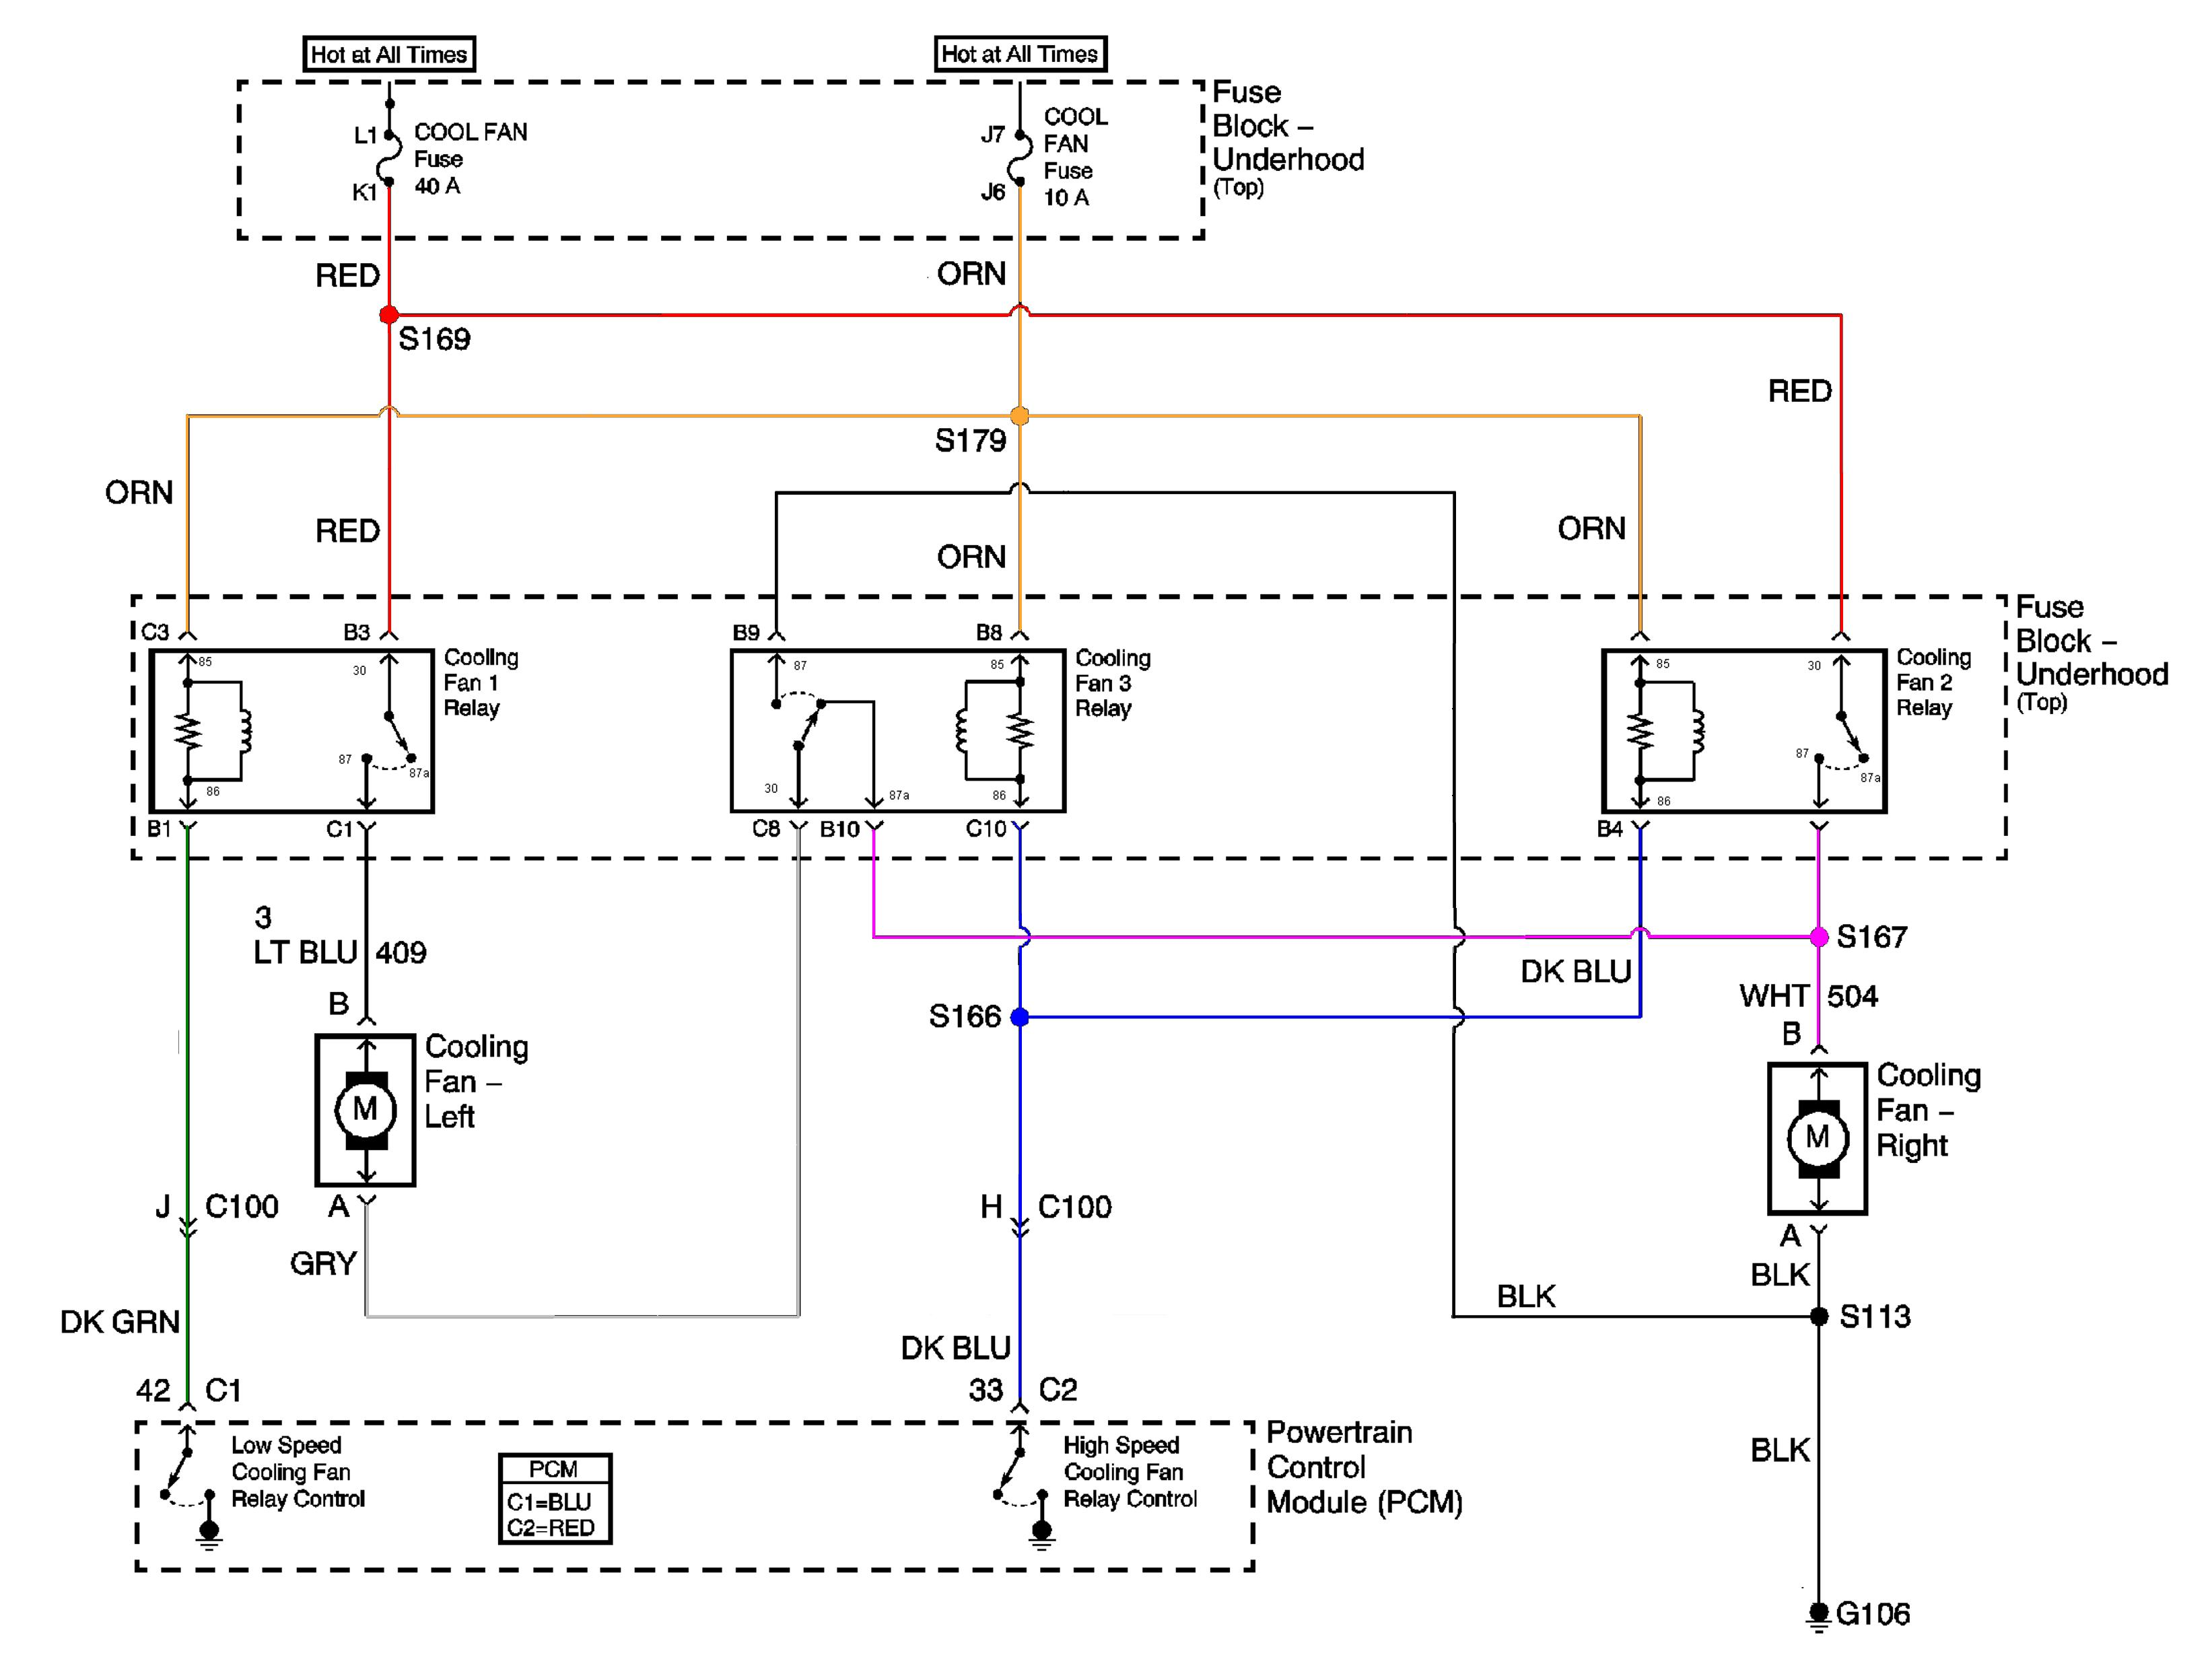 Awesome Engine Further Car Engine Cooling System Diagram Wiring Harness Wiring Cloud Icalpermsplehendilmohammedshrineorg